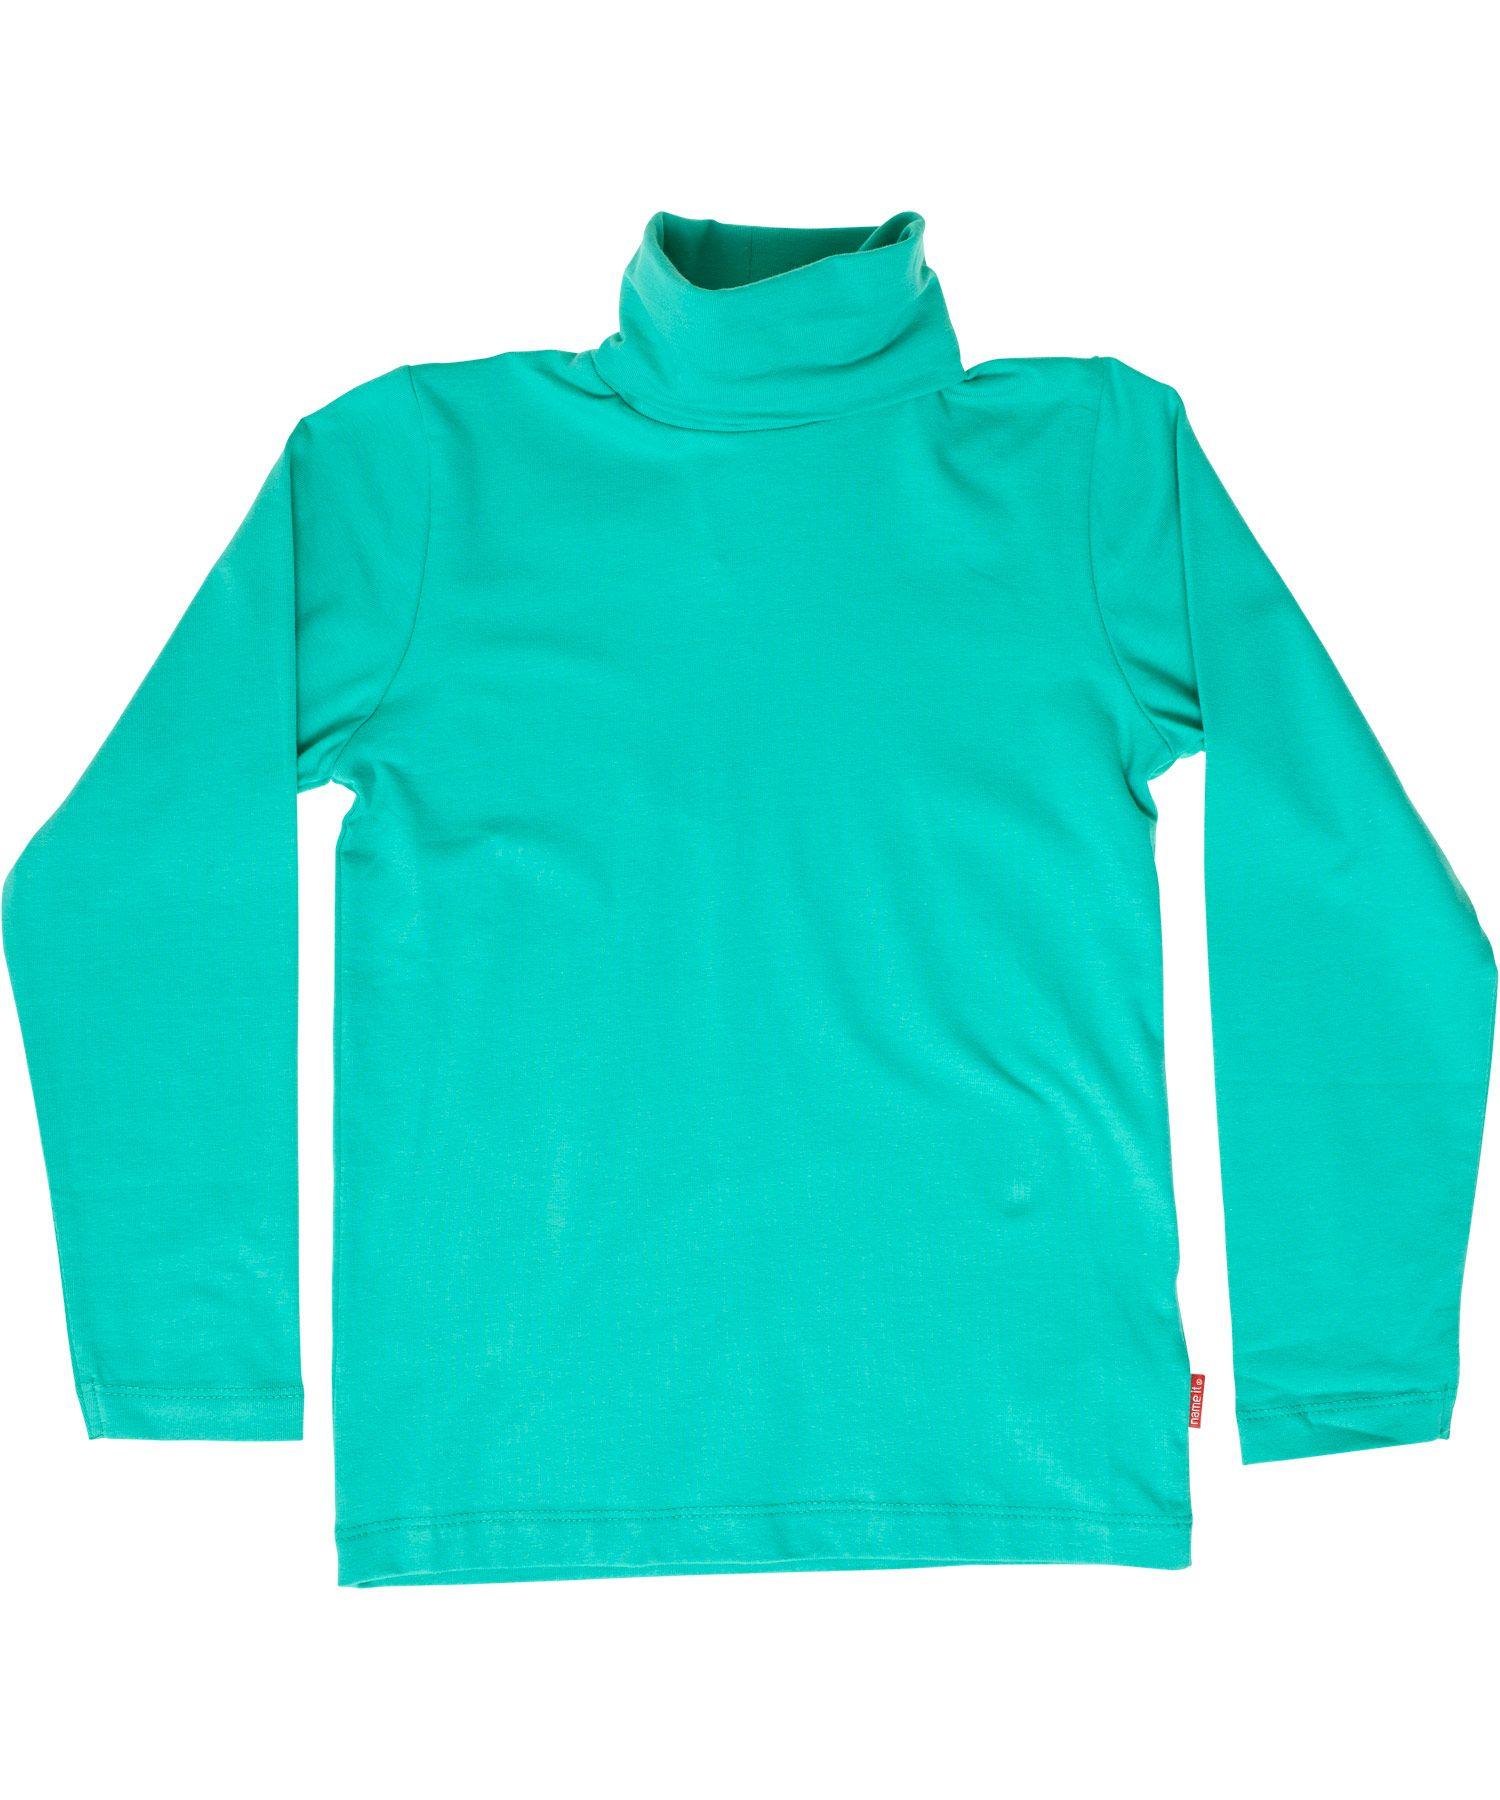 Name It muntgroene basis t-shirt met rolkraag. name-it.nl.emilea.be